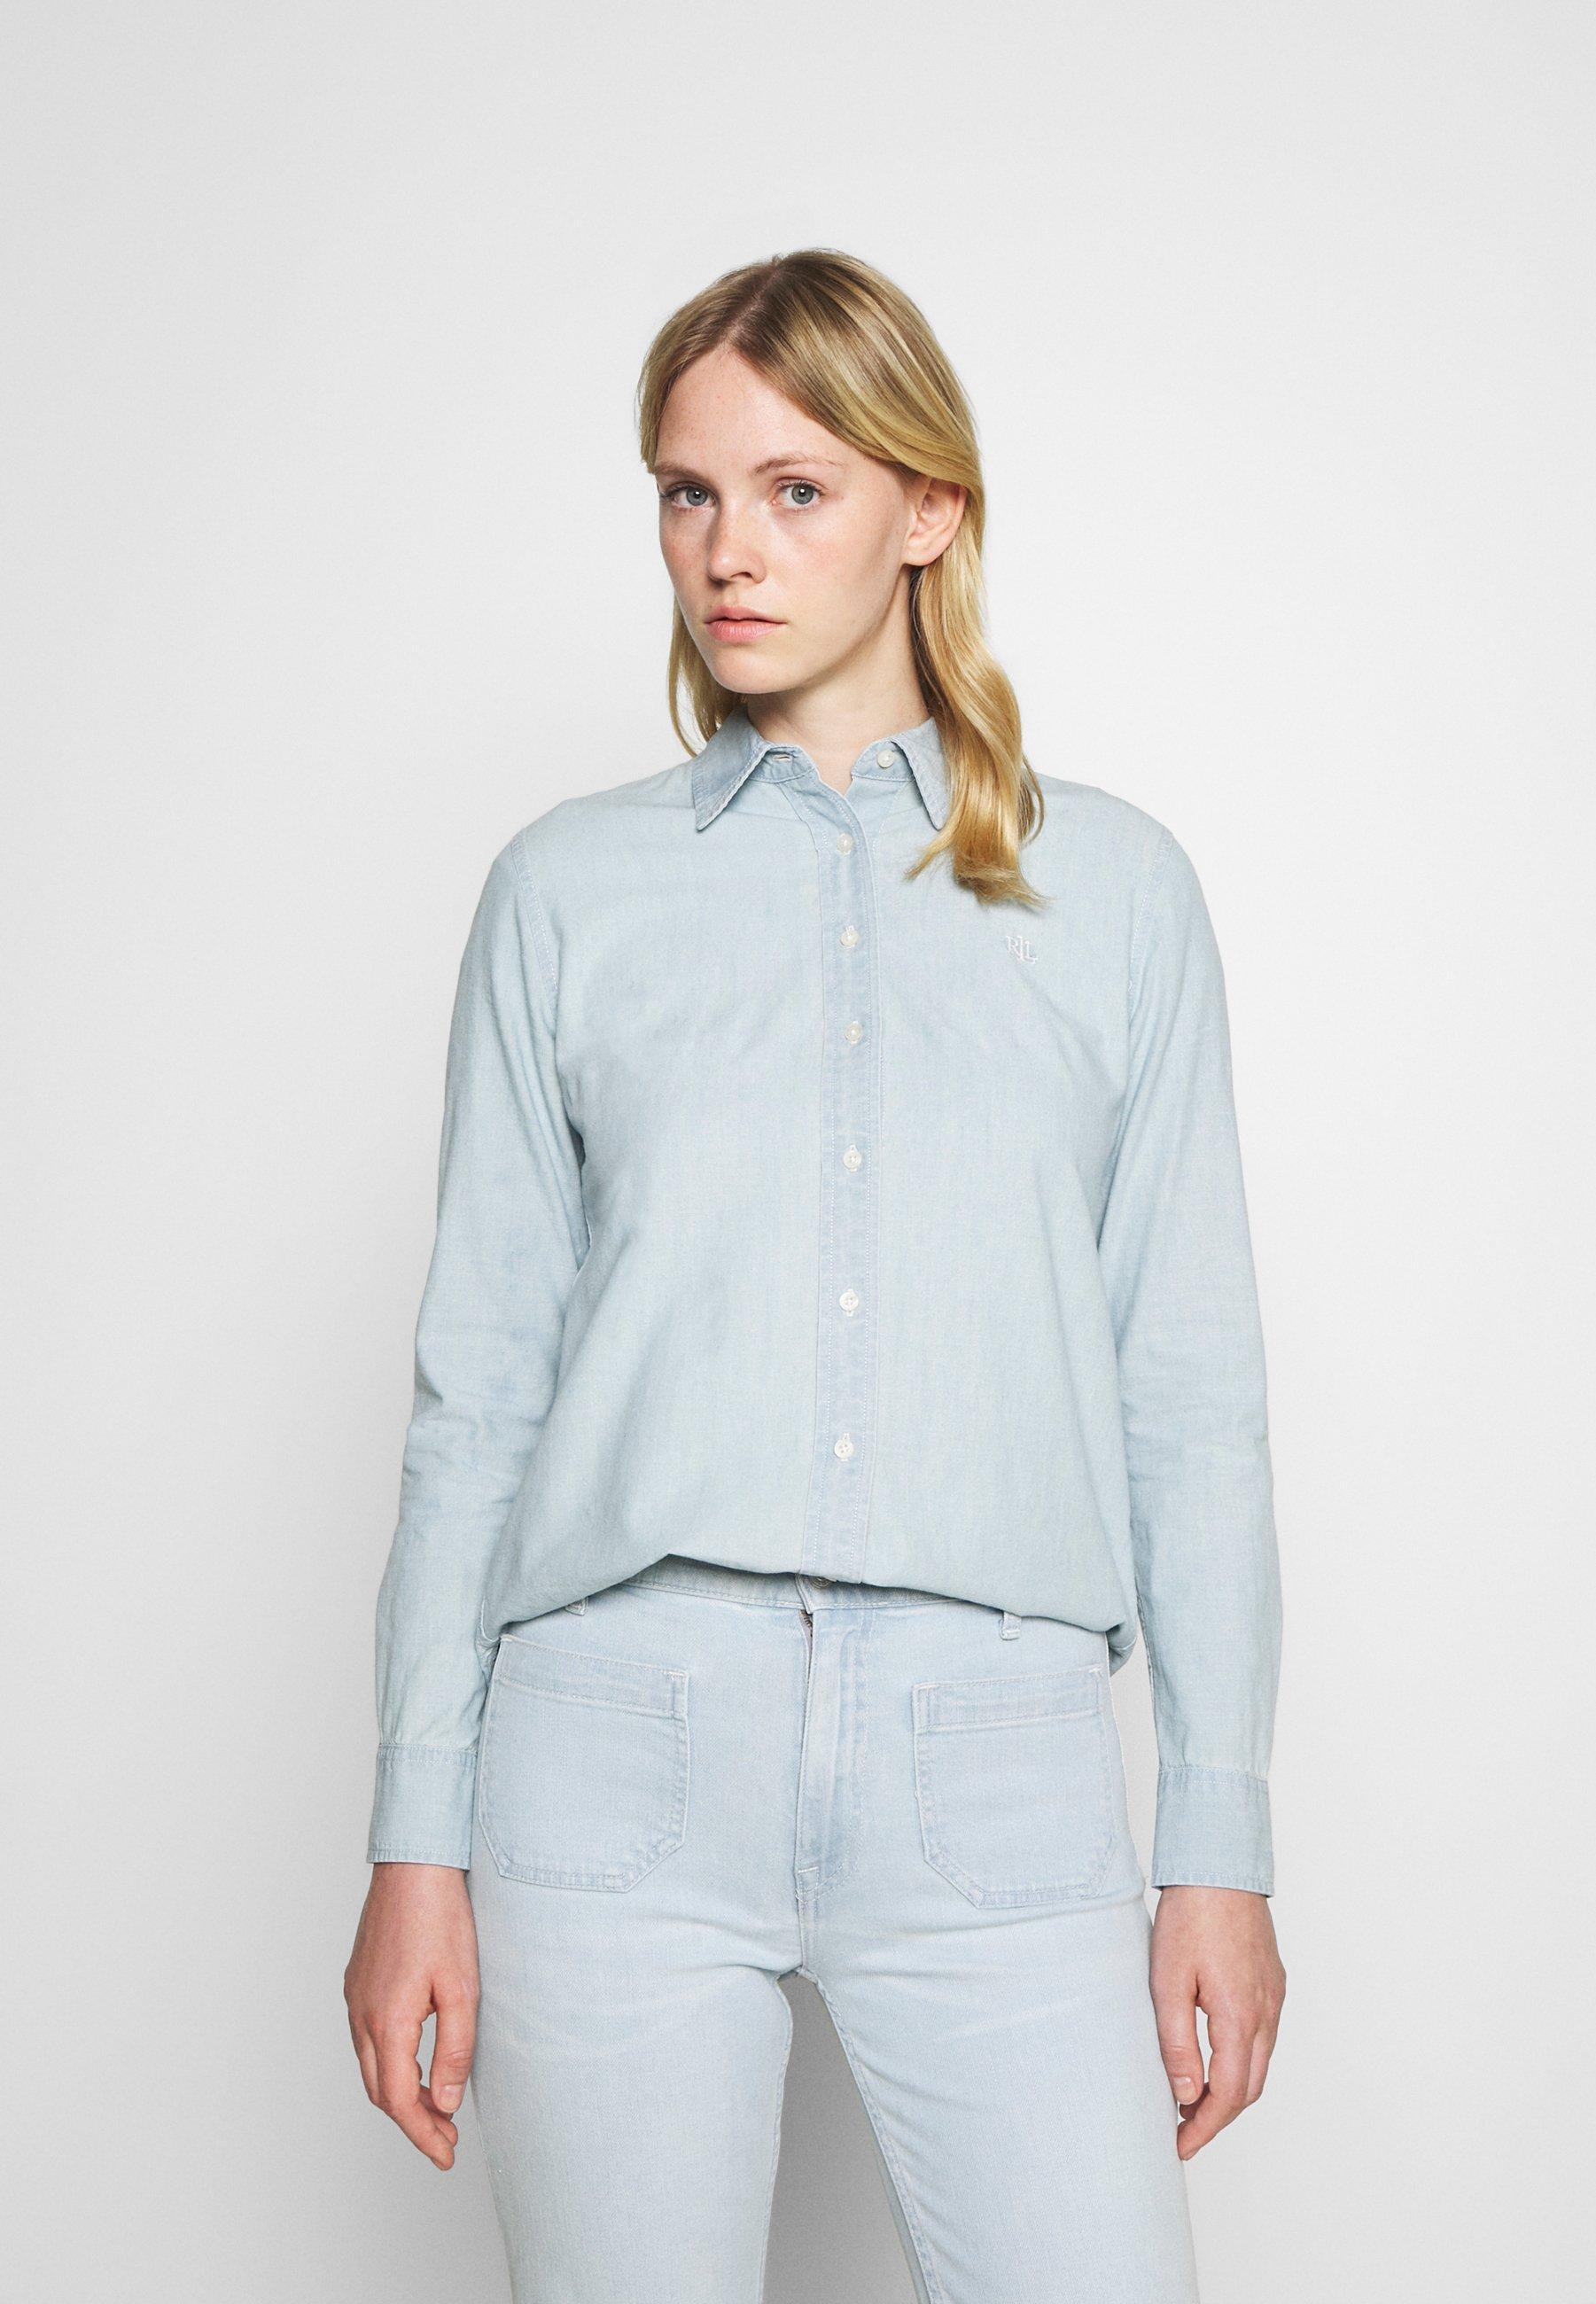 Donna JAMELKO LONG SLEEVE BUTTON FRONT SHIRT - Camicia